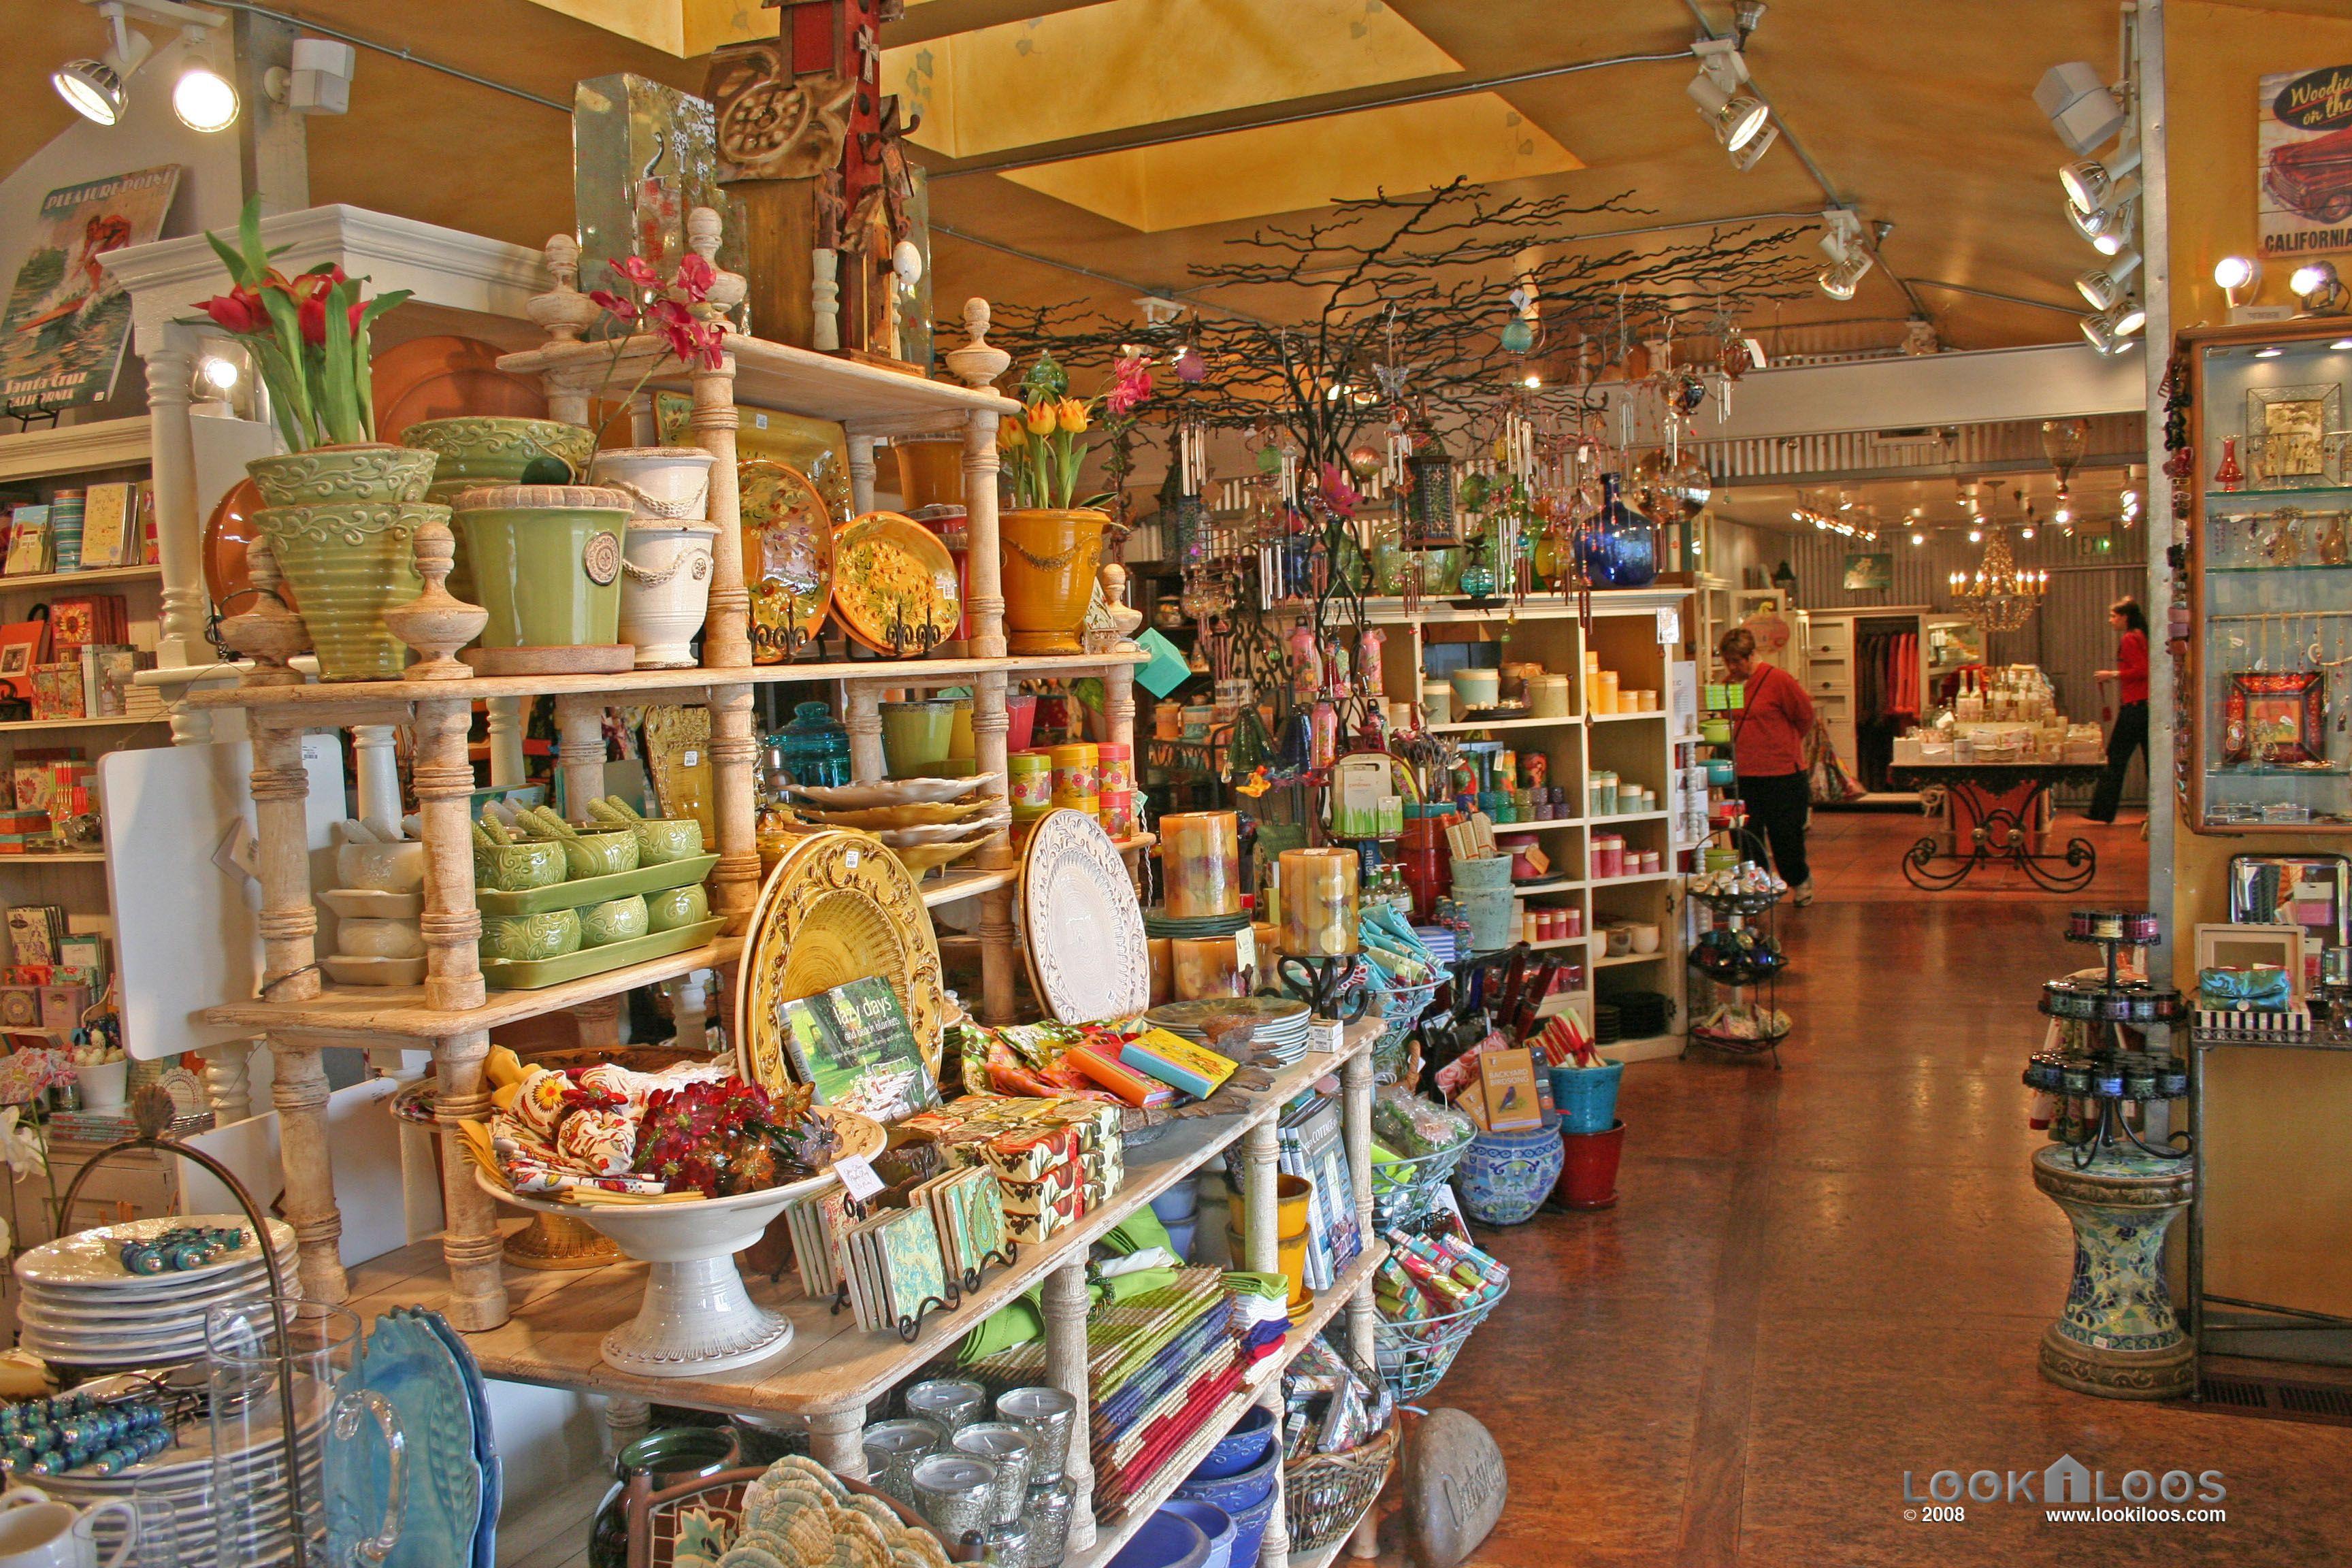 Outside In - A European-inspired Home and Garden Shop in Aptos. An ...